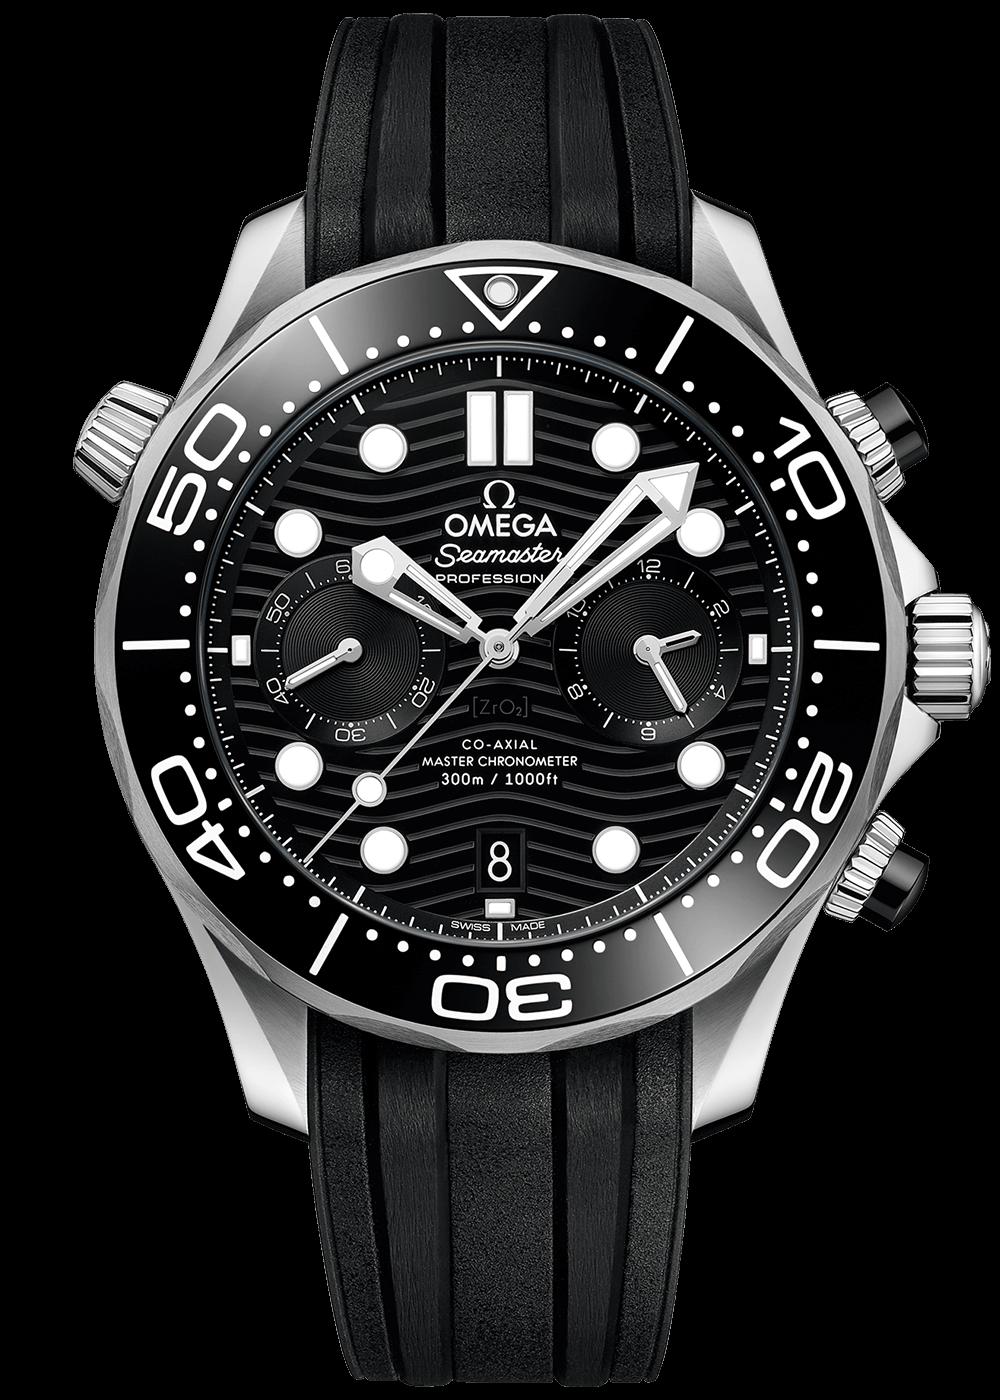 Omega Seamaster Diver 300m Master Chronometer Chronograph 44m